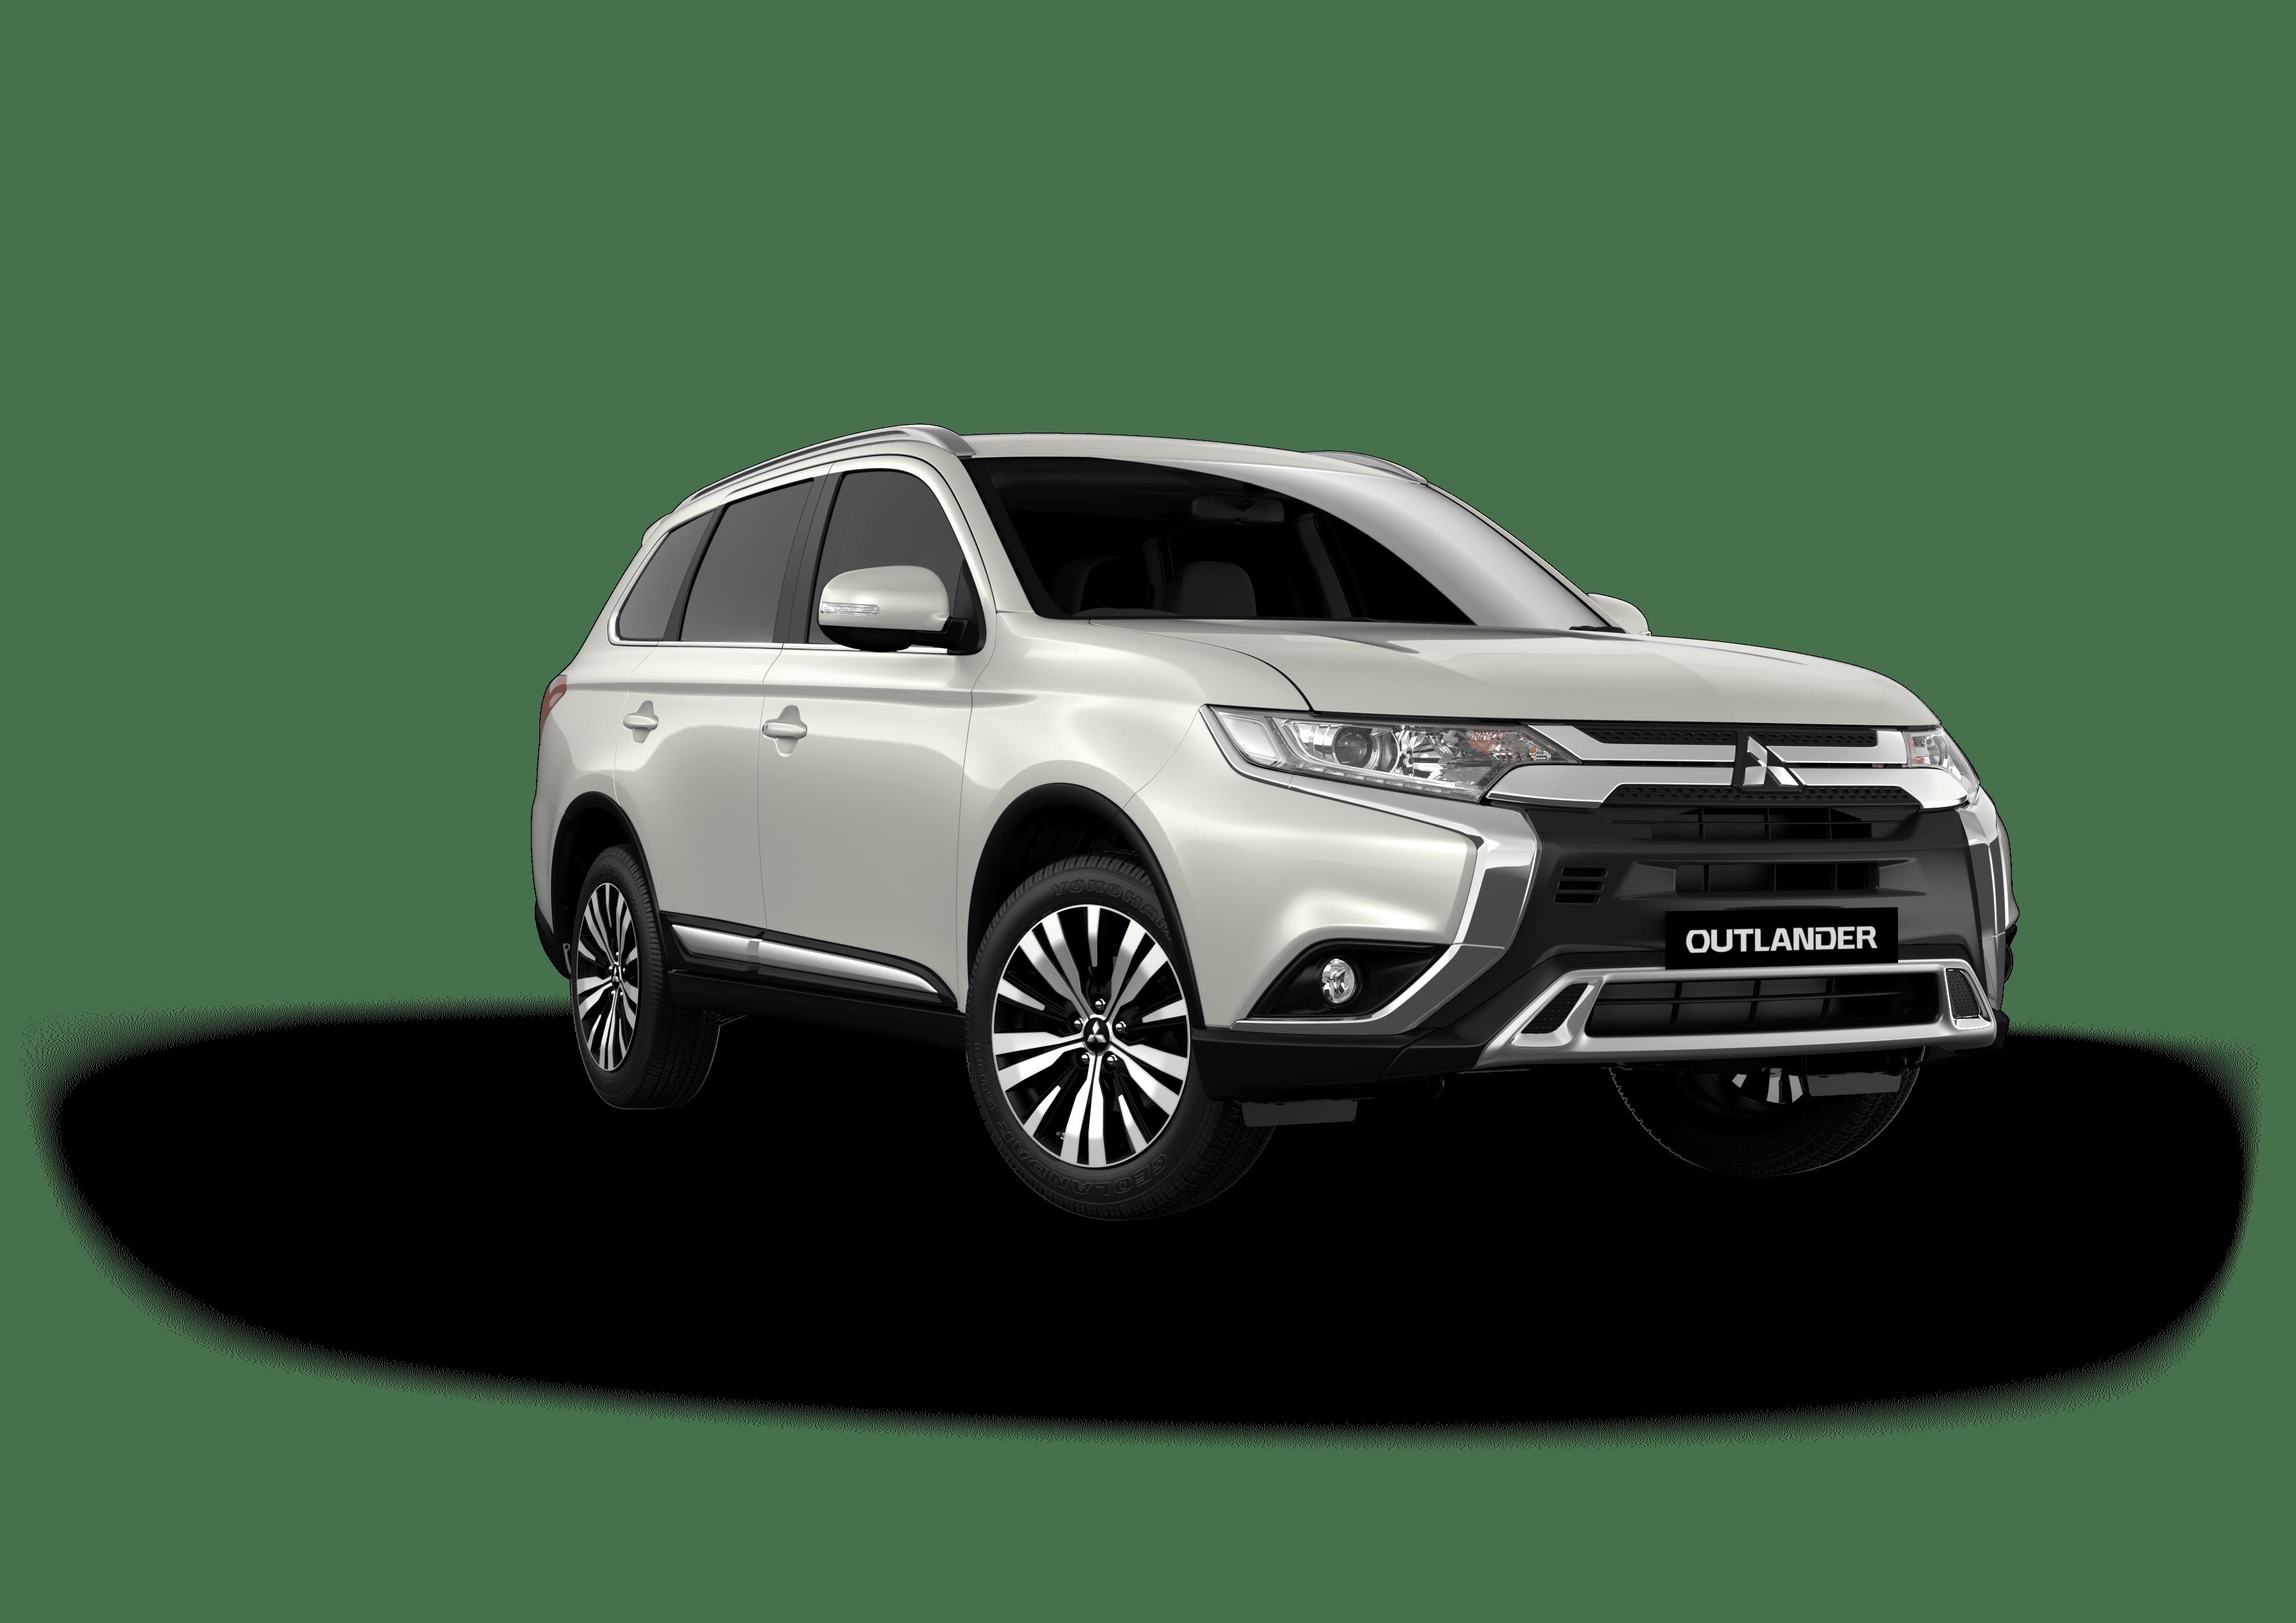 2019 Mitsubishi OUTLANDER 2019 (MY20) Mitsubishi ZL Outlander LS 2.4L PET CVT 2WD 7S